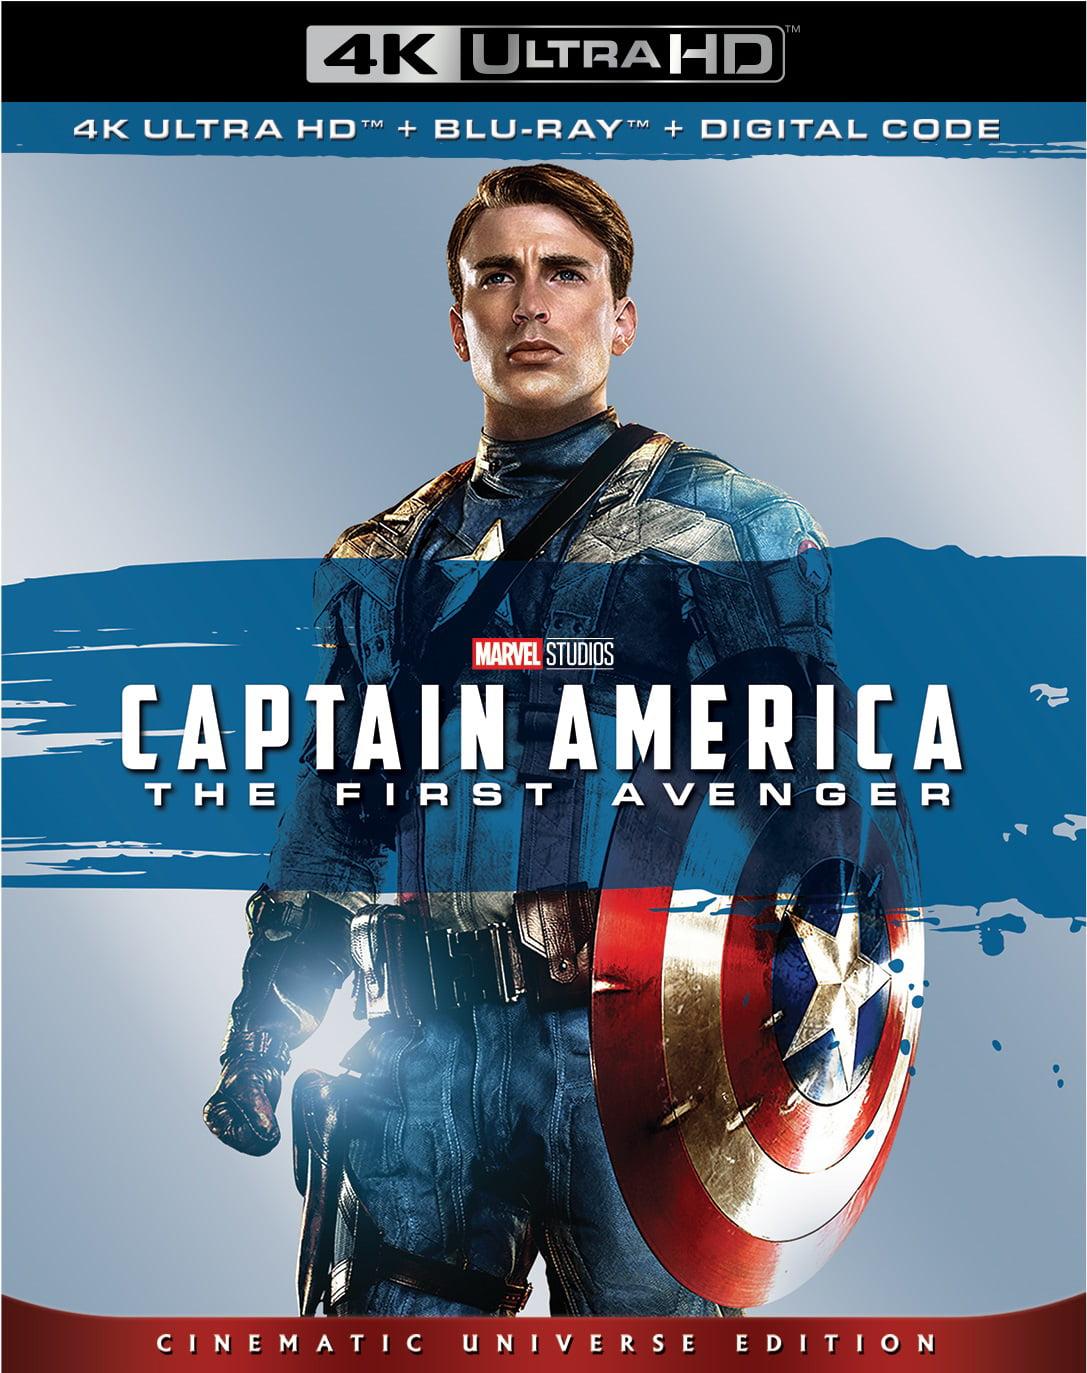 Uhd Capitan America El Primer Vengador Captain America The First Avenger 2011 Joe Johnston Y Secuelas